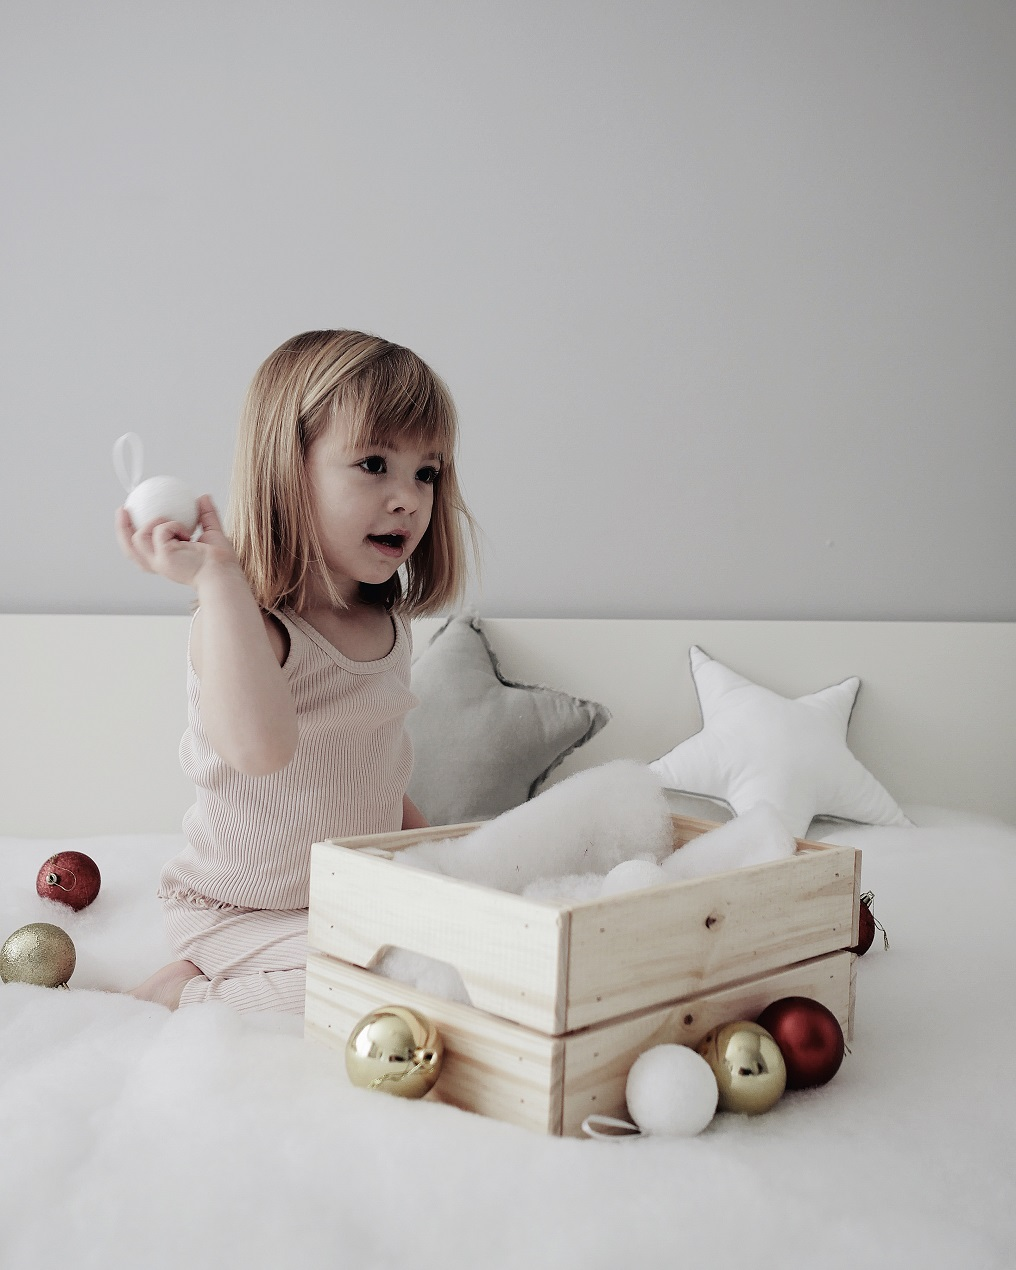 Awaiting Christmas with Minimalisma